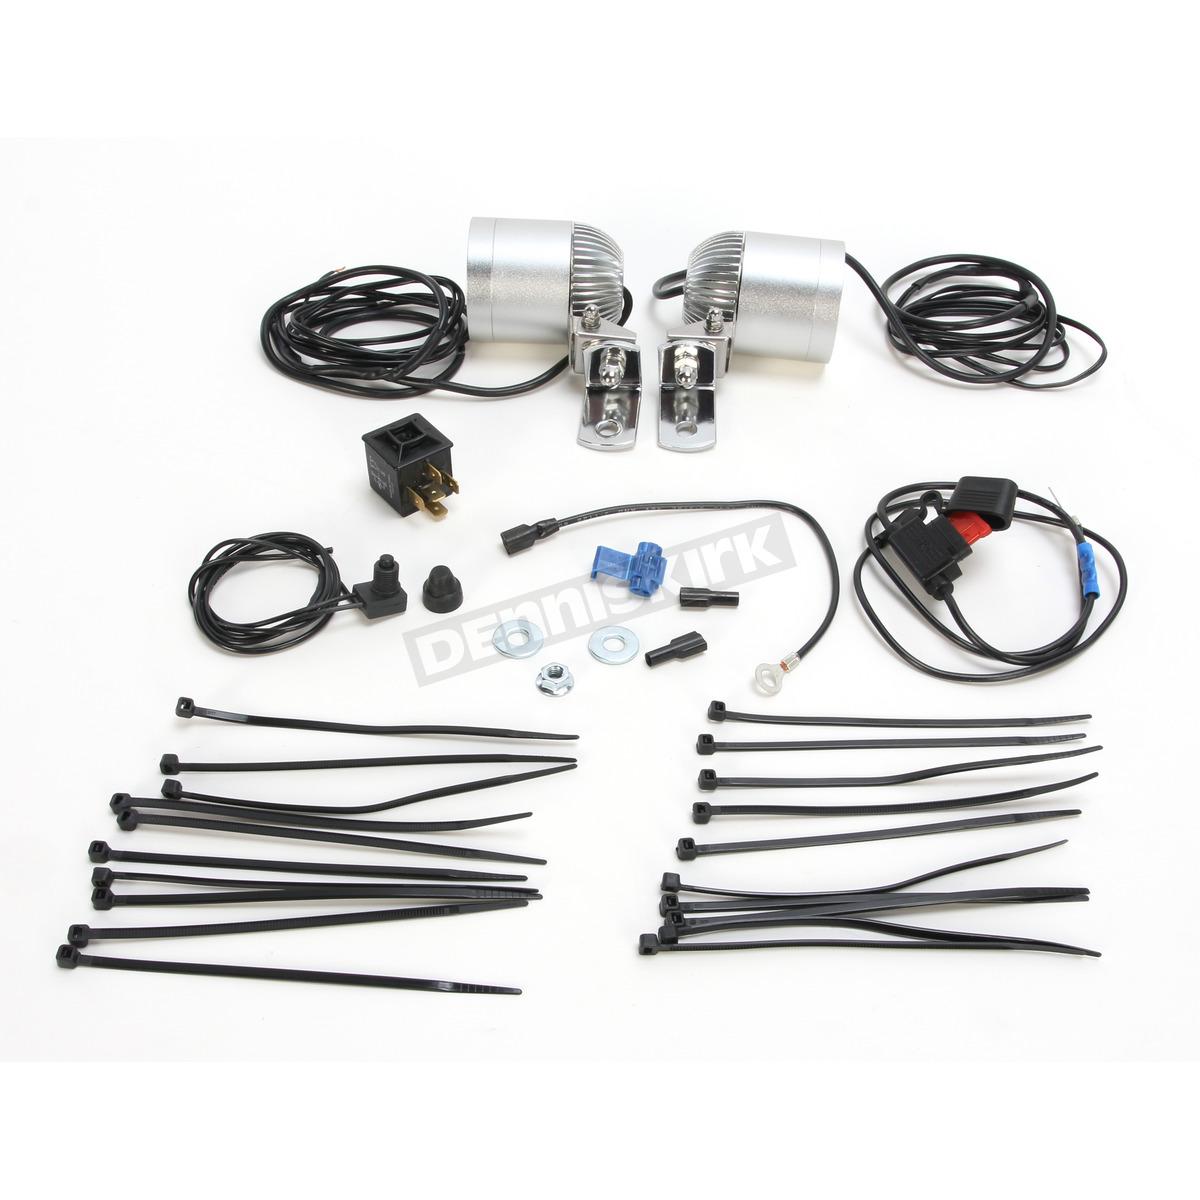 Rivco 2 In Led Driving Light Kit